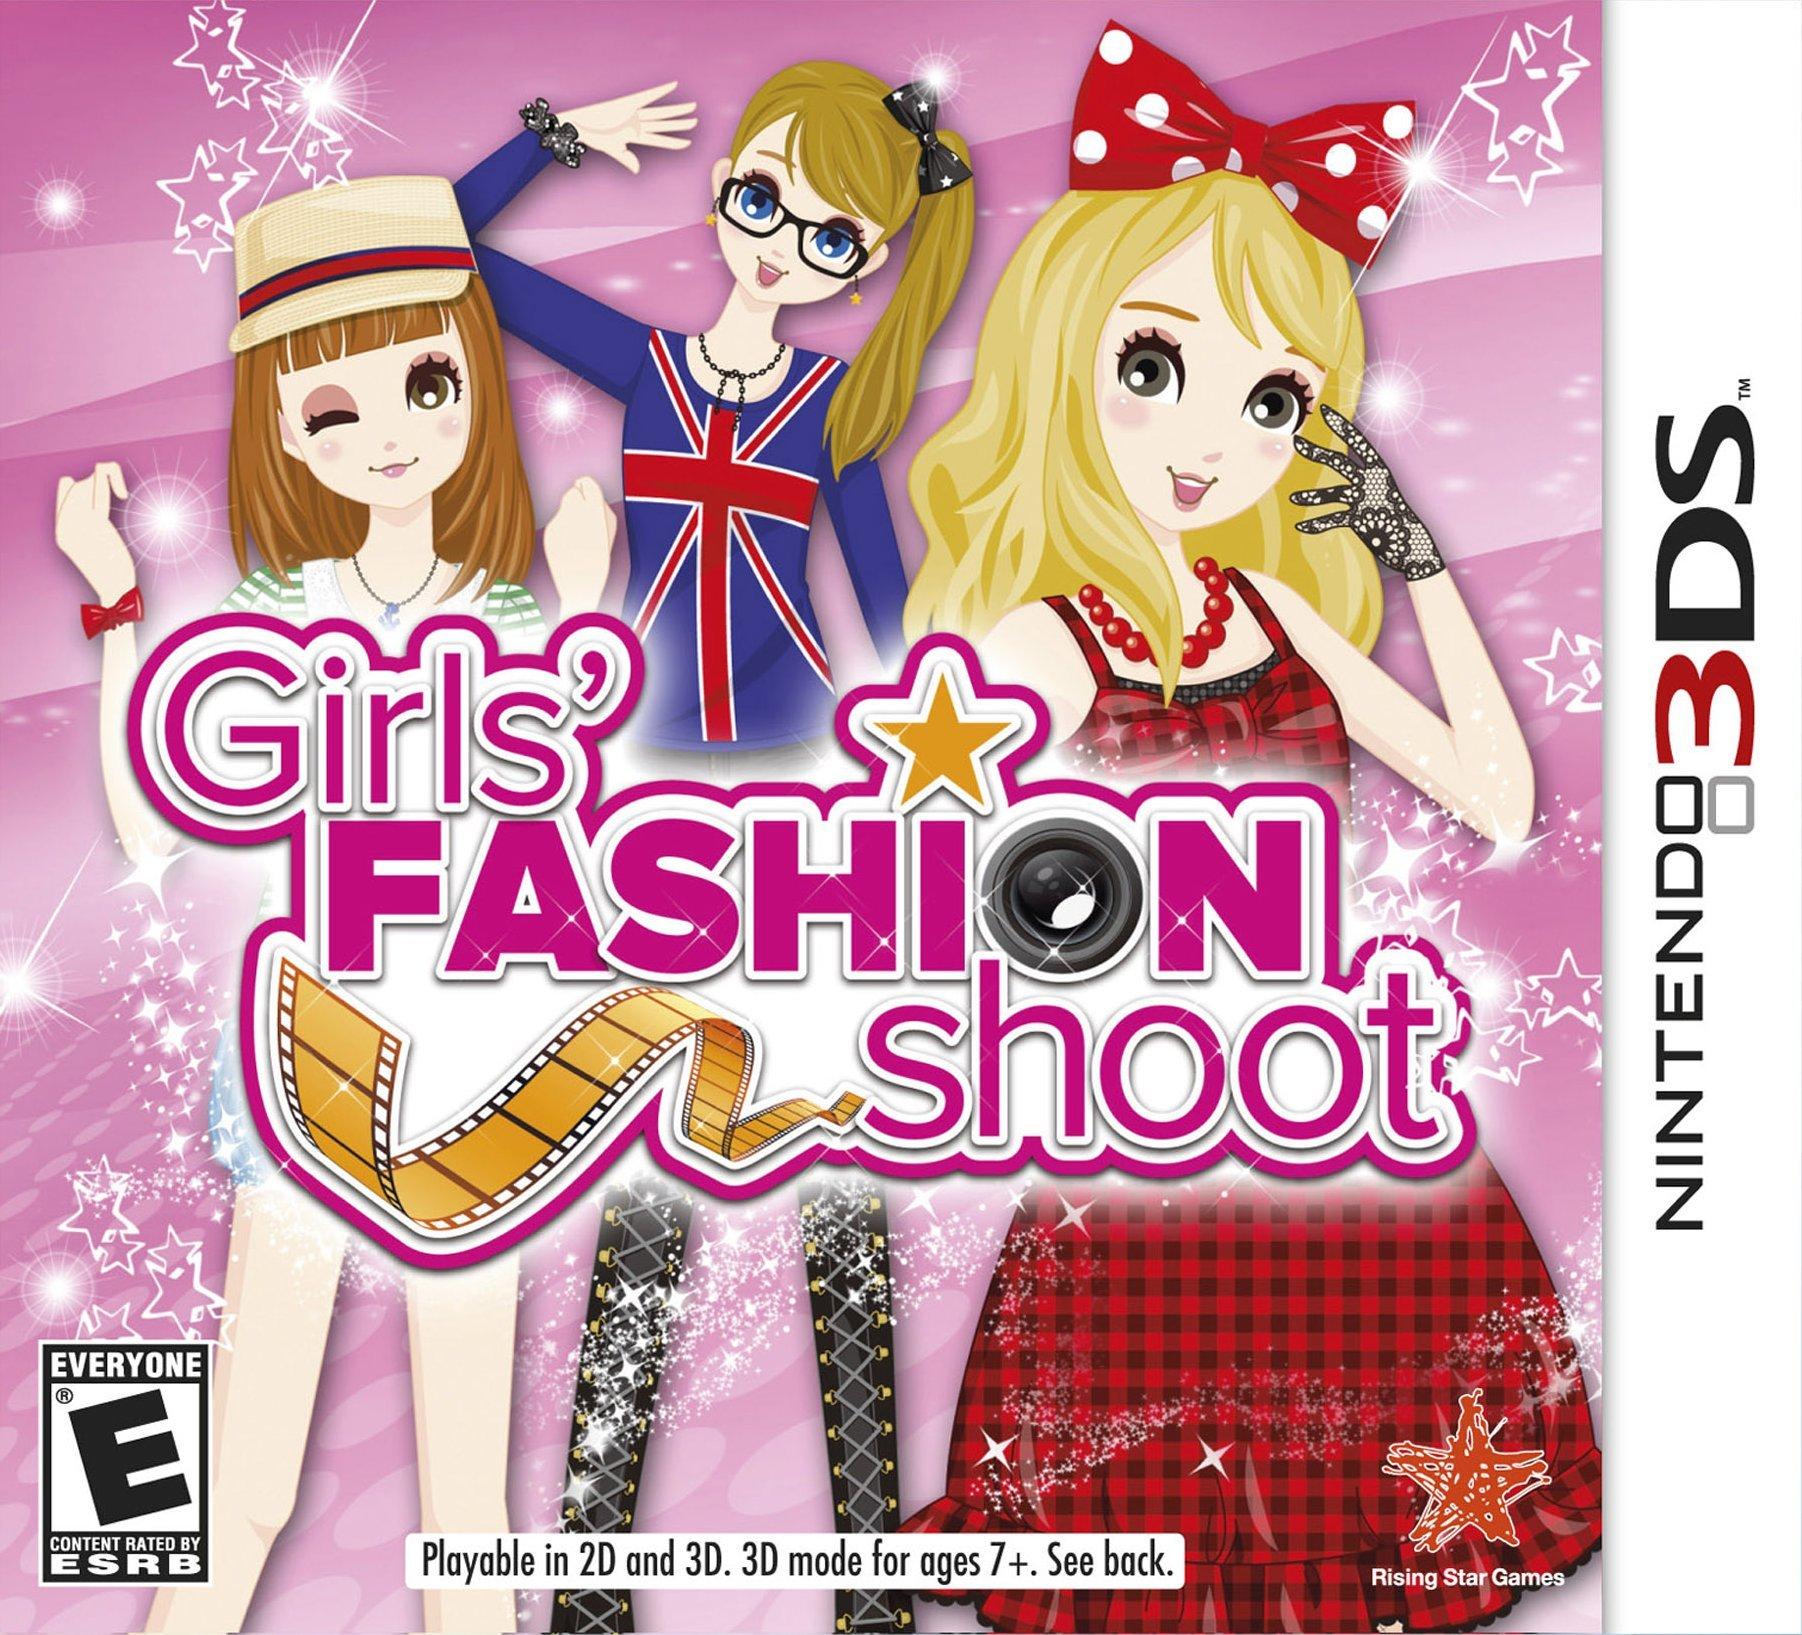 Girls' Fashion Shoot - Nintendo 3DS